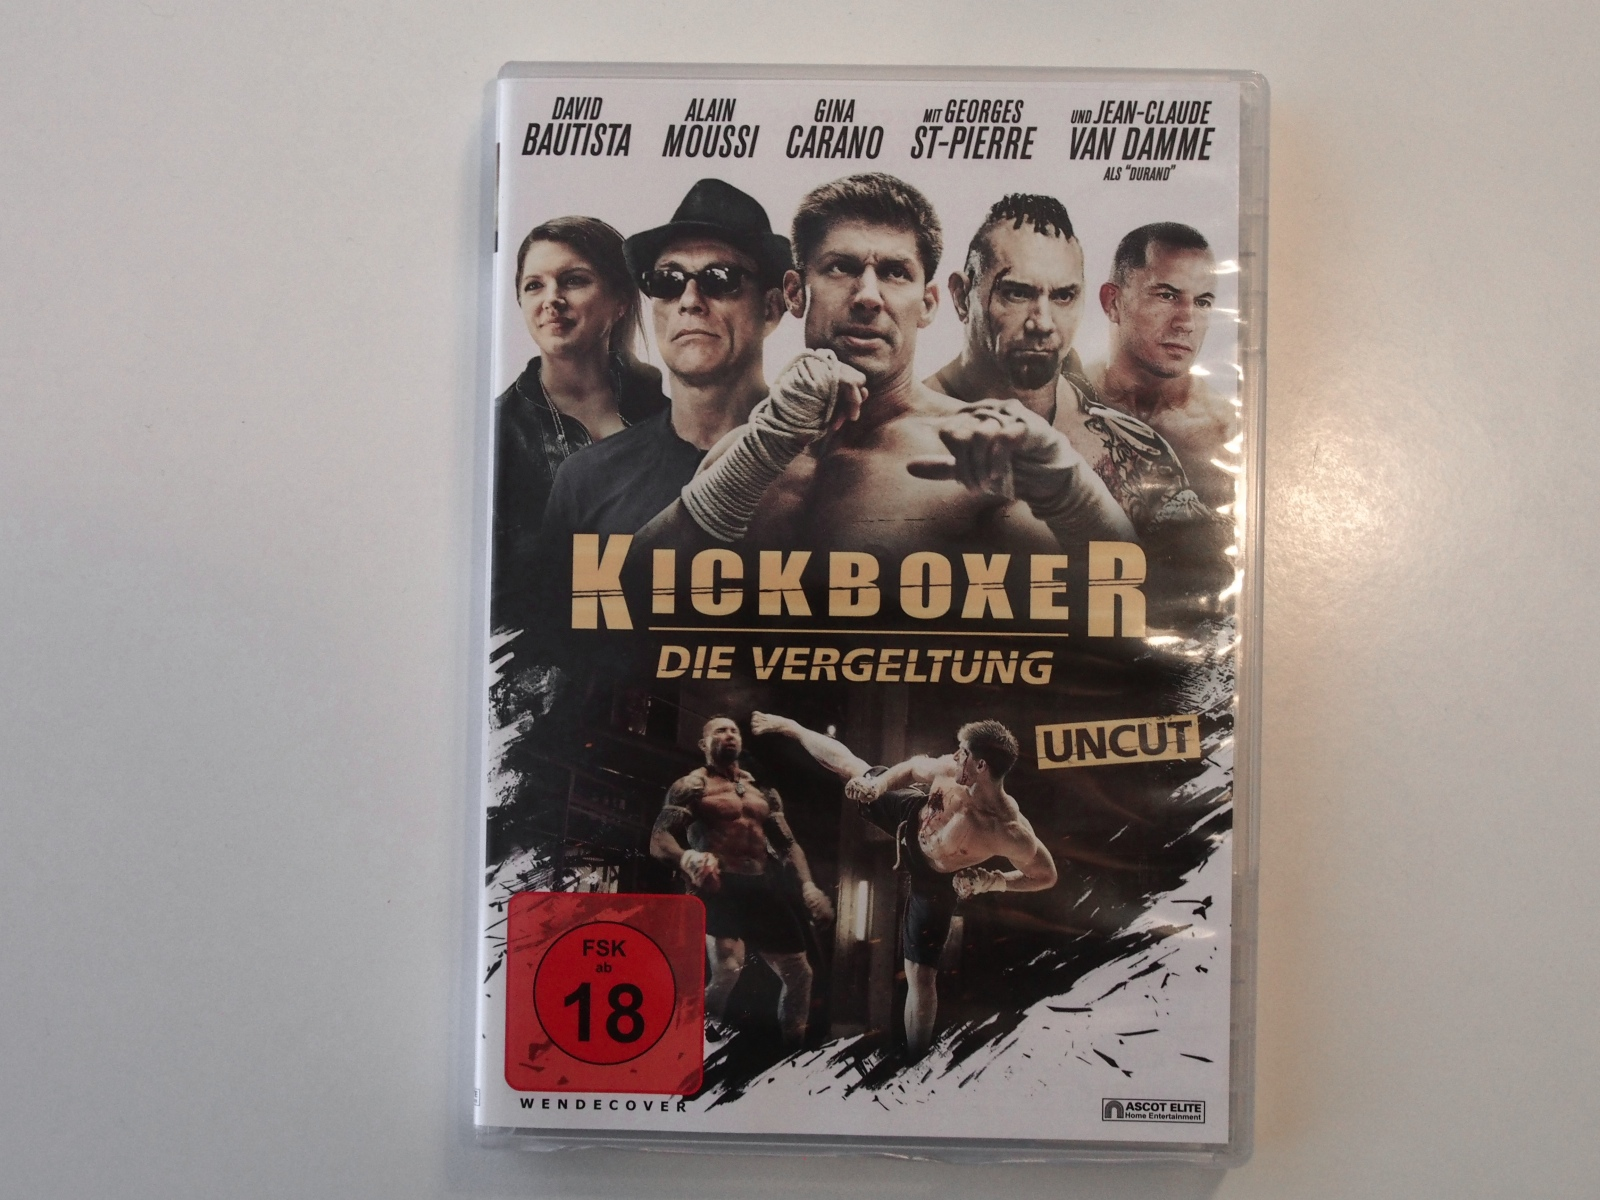 Kickboxer - Cover - Fotodinge.de